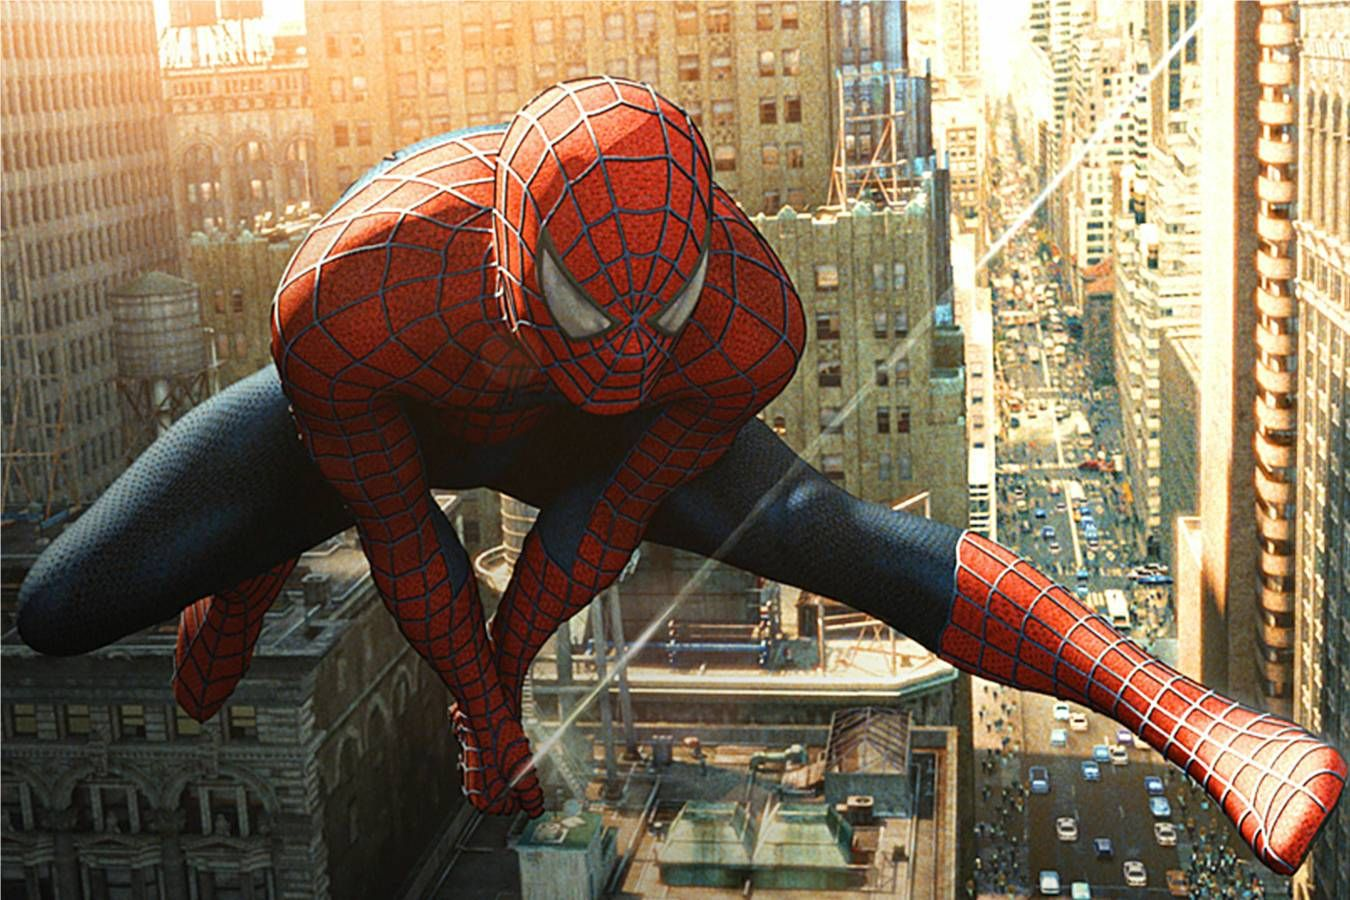 Hd wallpaper spiderman - Spiderman Comic Wallpapers Hd Wallpapers Walldevil Best Free Hd